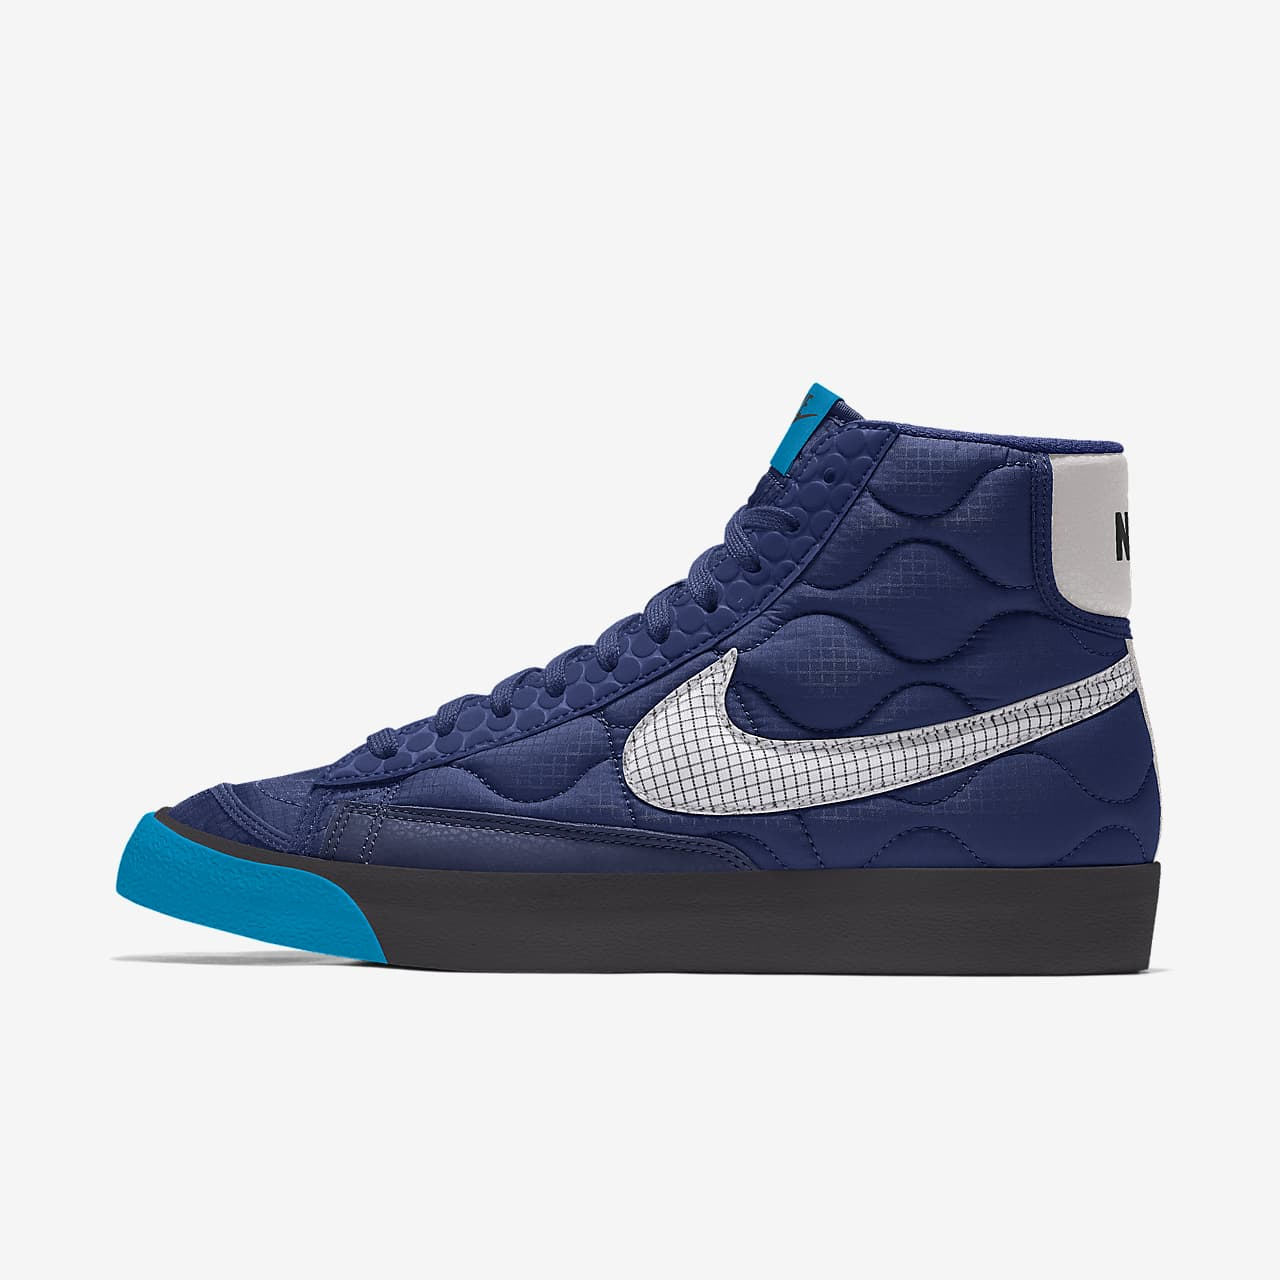 Nike Blazer Mid Vintage '77 3M™ By You Custom Shoe